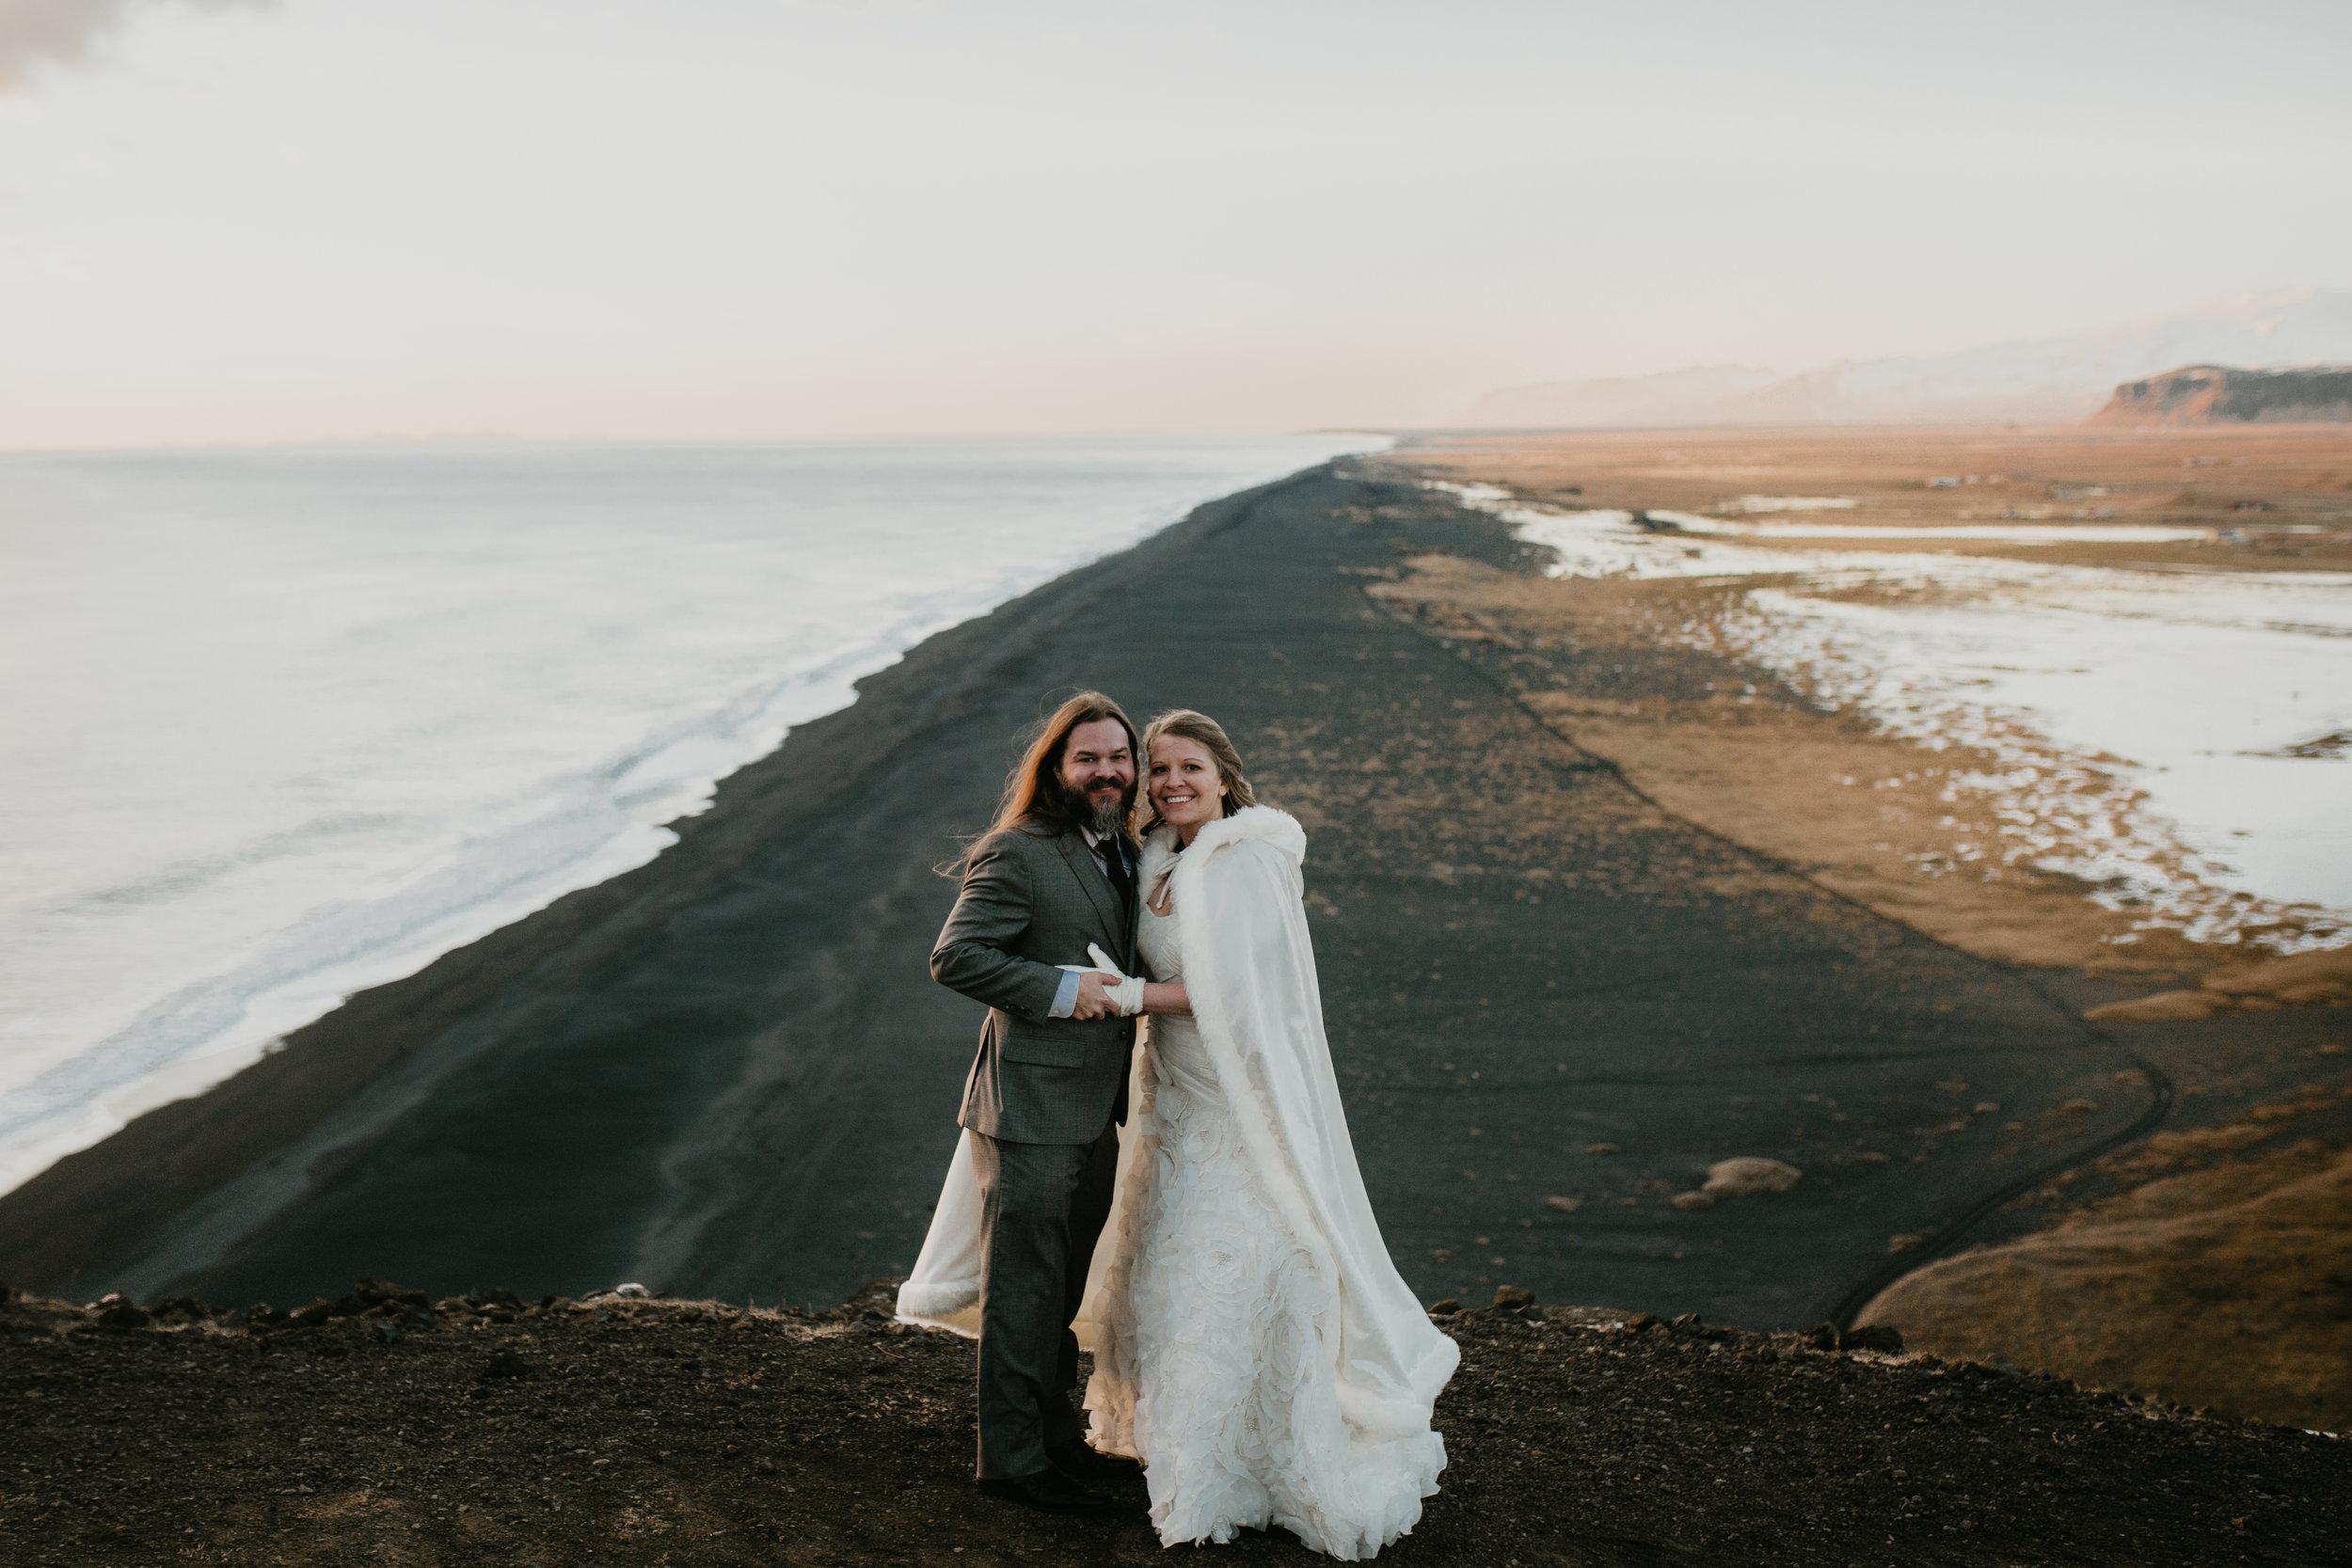 nicole-daacke-photography-iceland-winter-sunset-adventure-elopement-skogafoss-waterfall-black-sand-beach-dyrholaey-vik-iceland-intimate-wedding-black-church-elopement-photographer-37.jpg